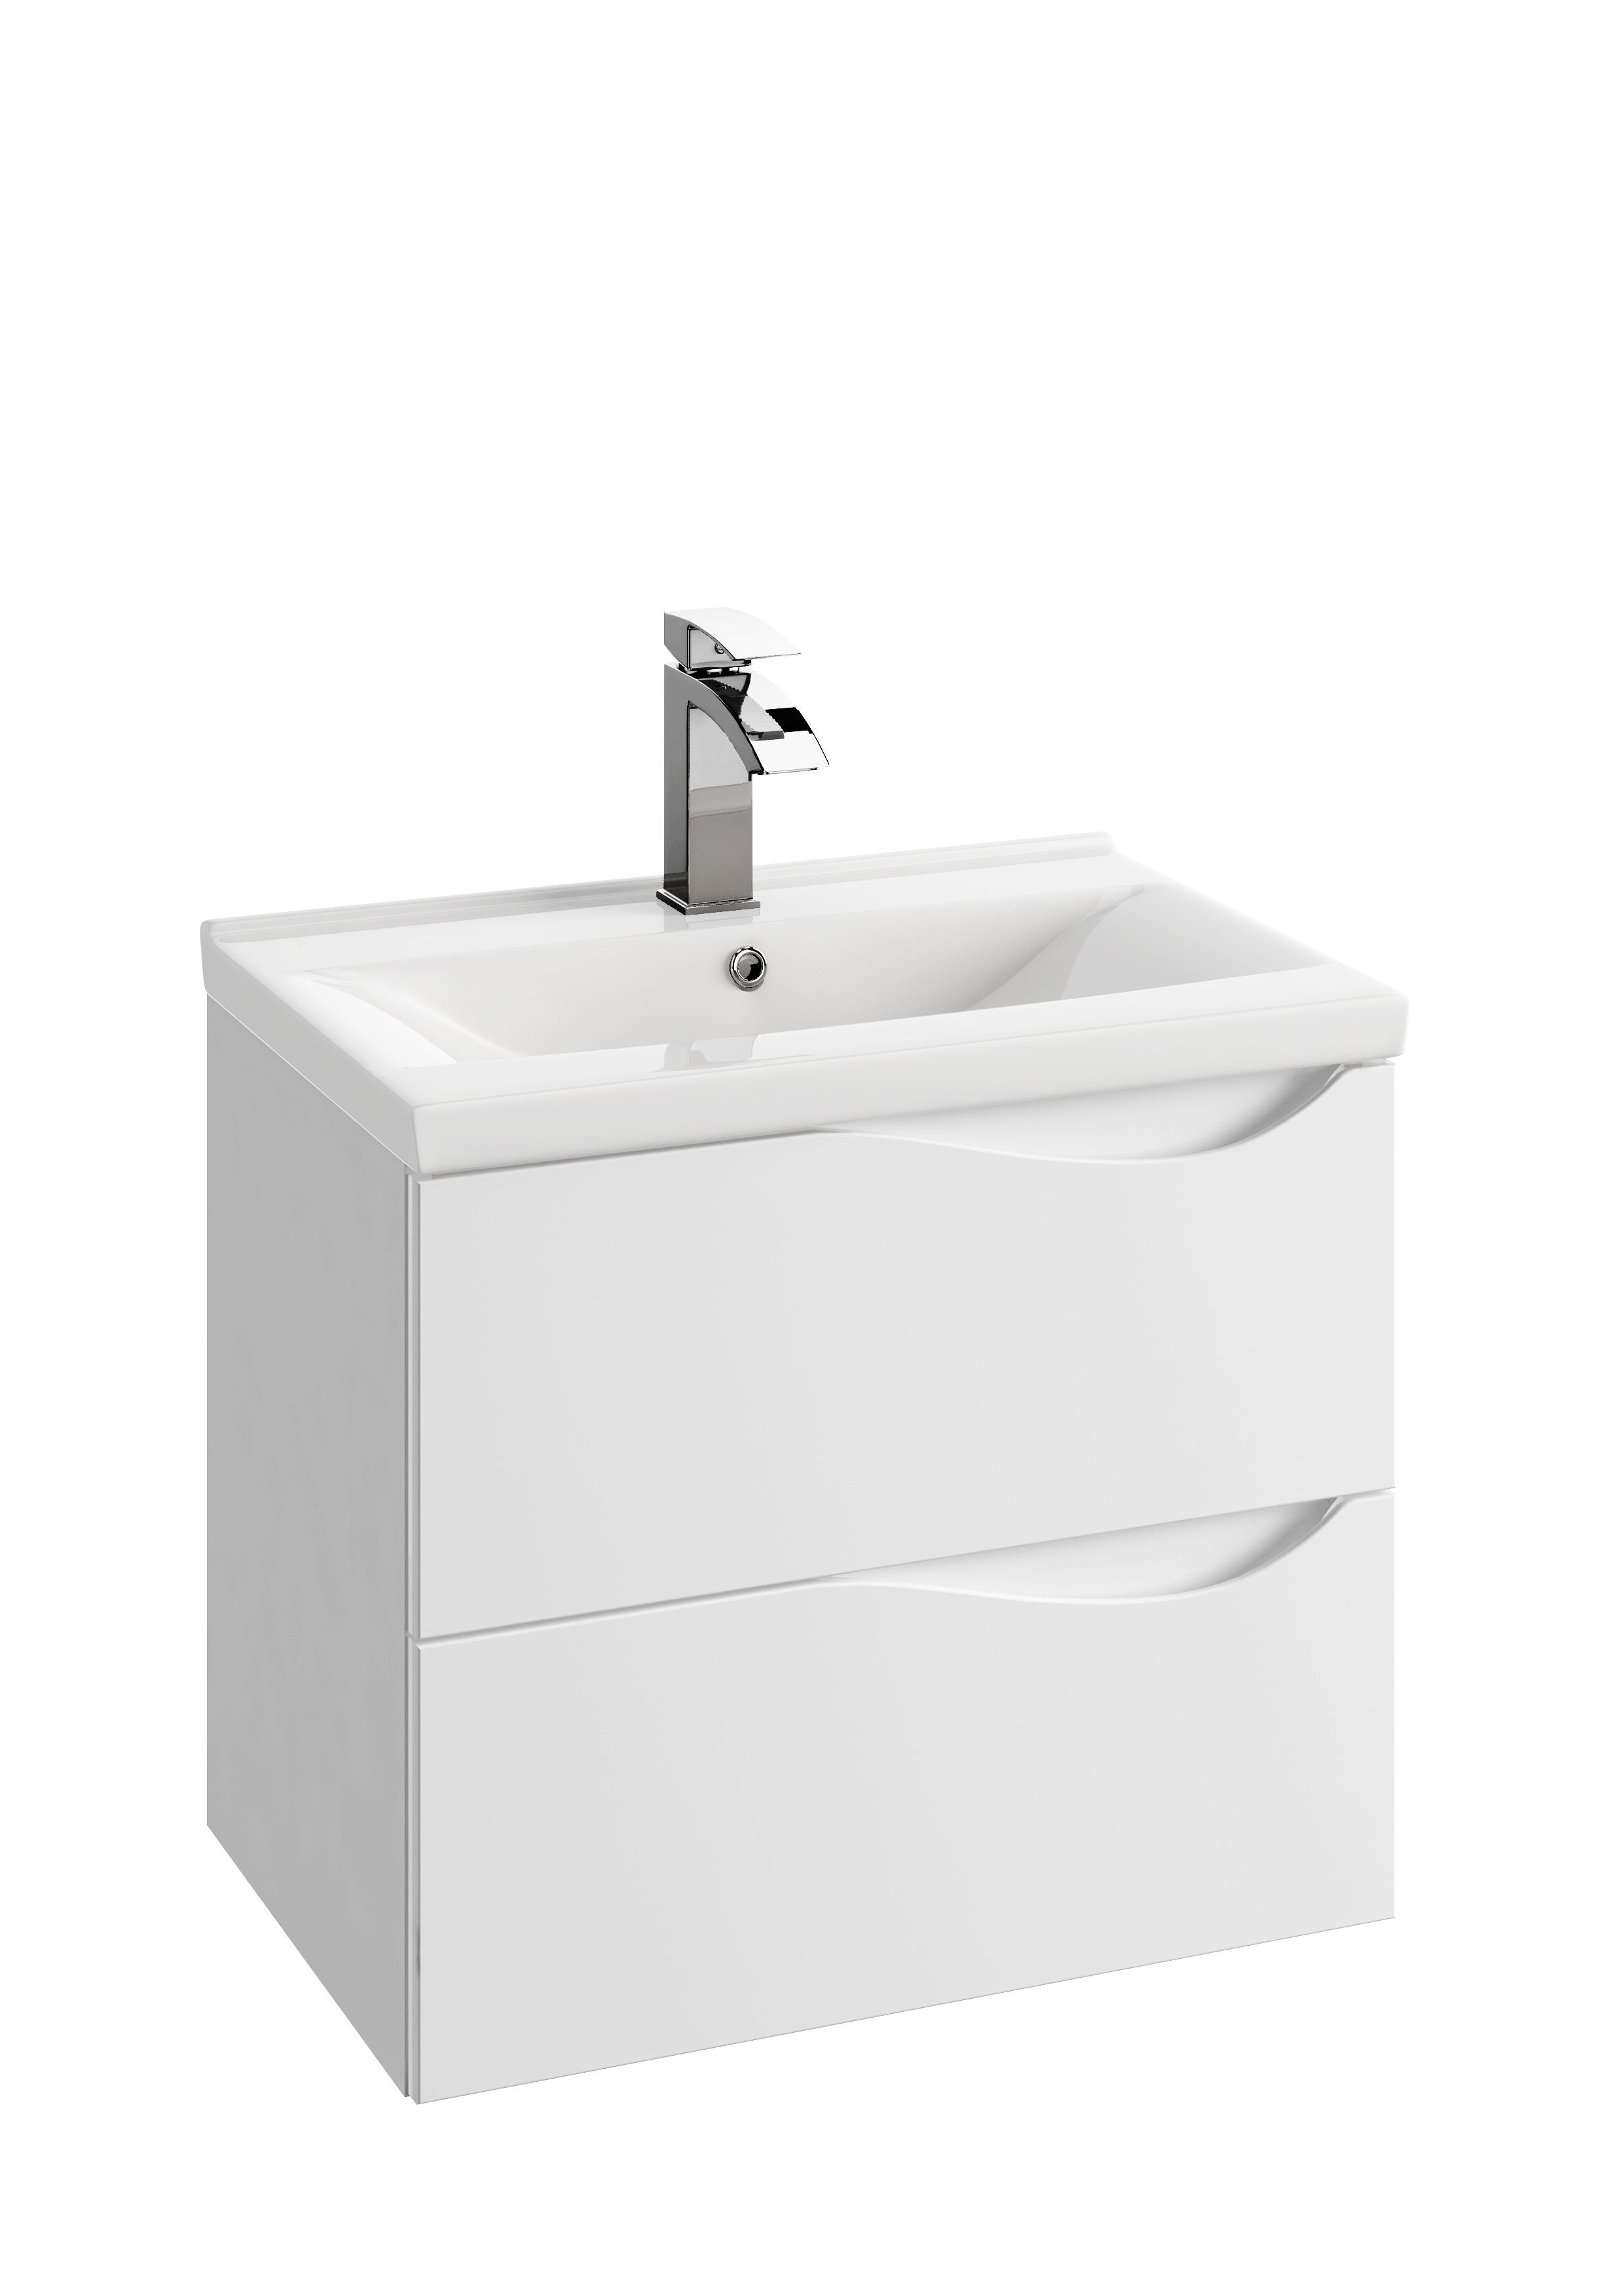 Szafka podumywalkowa Defra Murcia D60 biały połysk łezka 59,9x50x39,8cm 144-D-06004